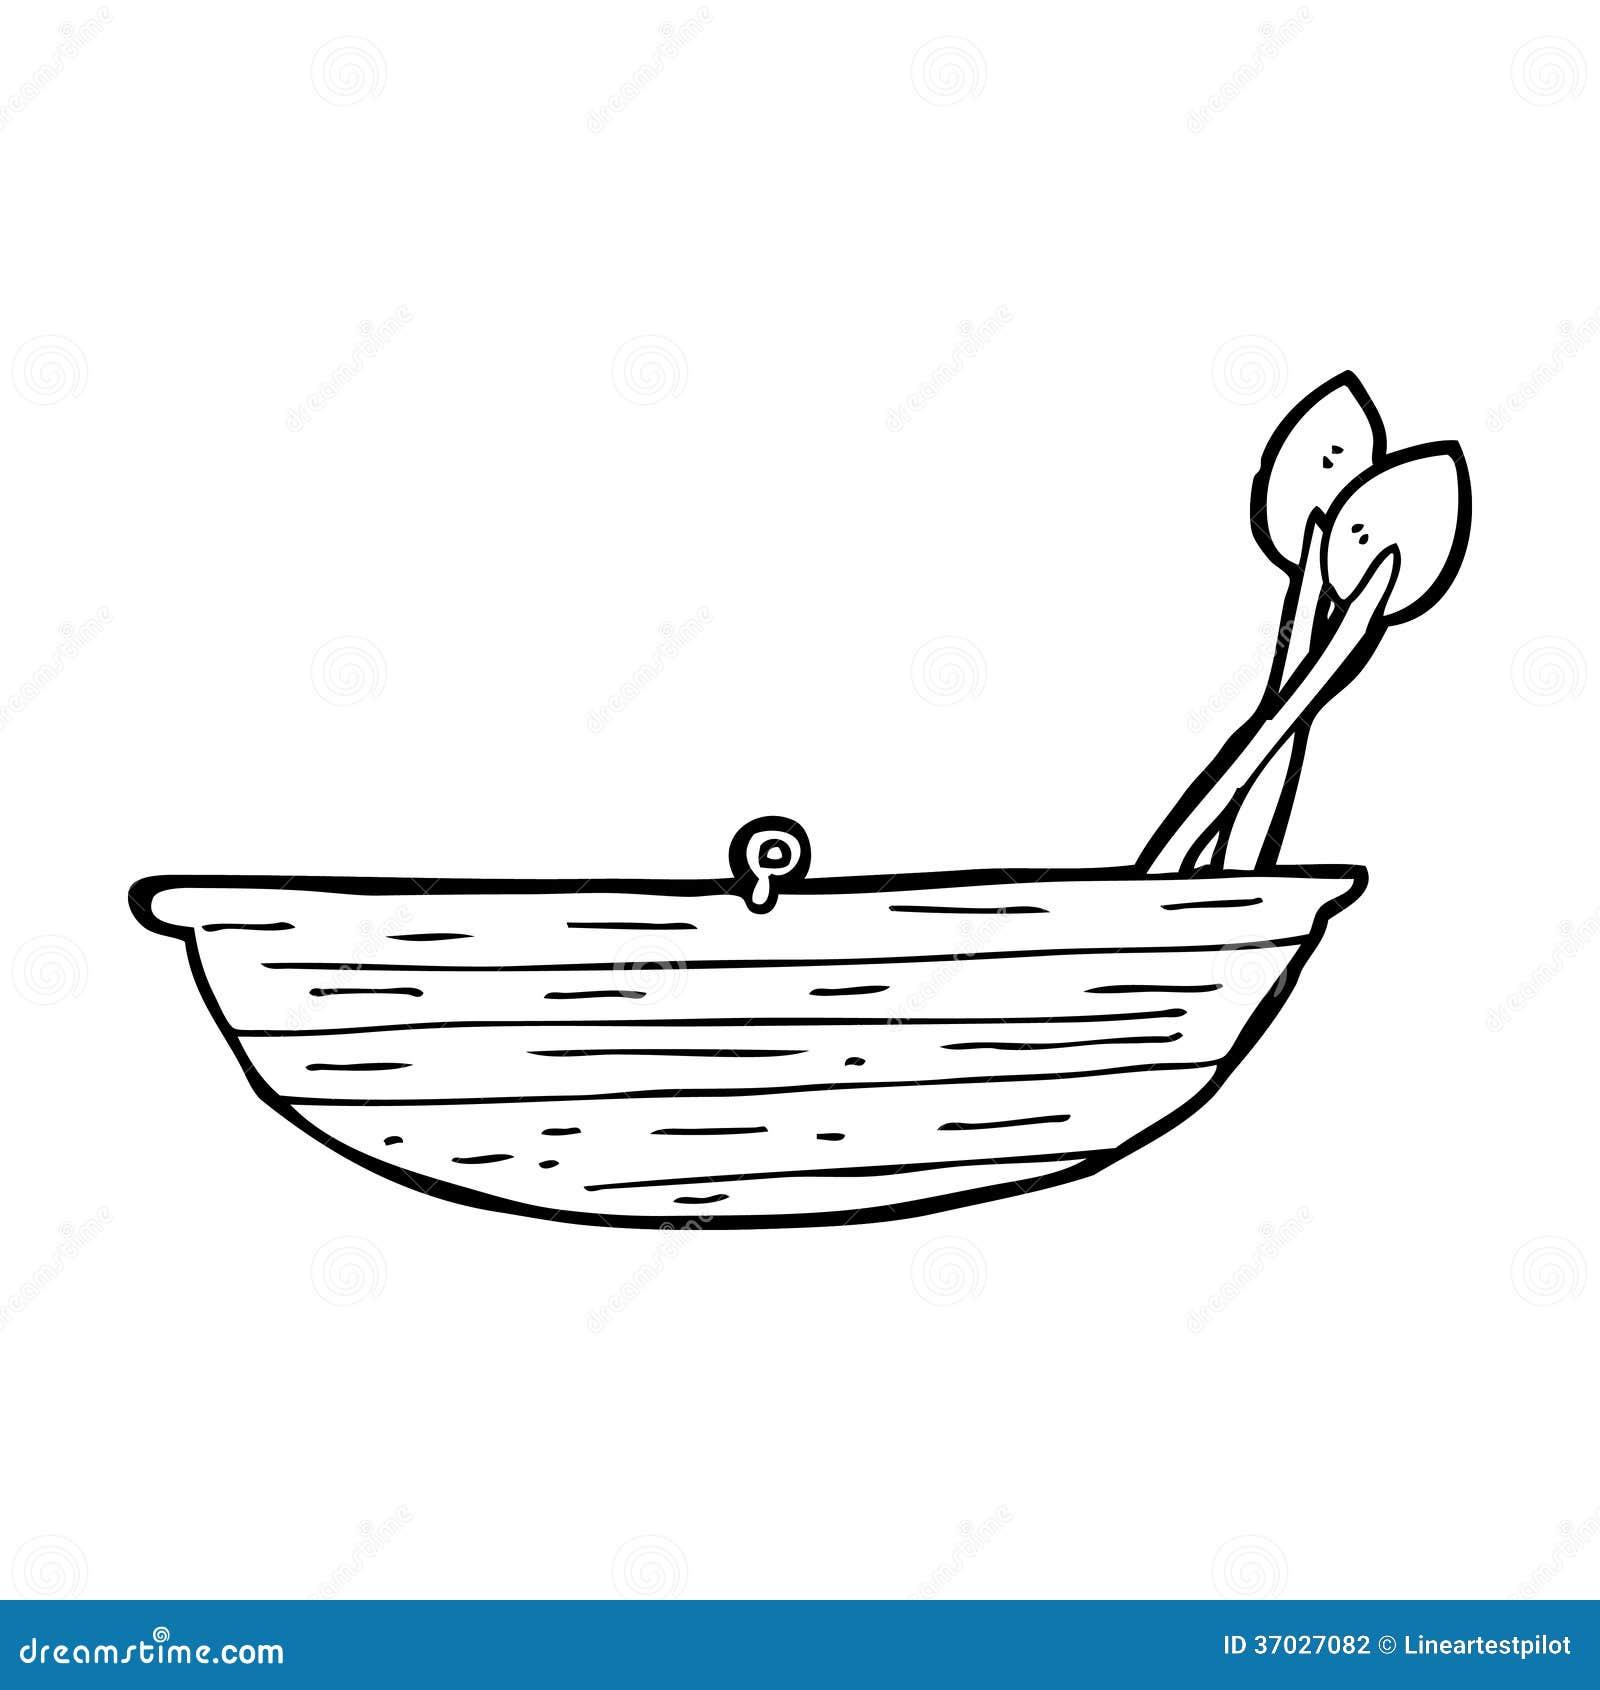 Cartoon rowing boat stock illustration. Illustration of ...